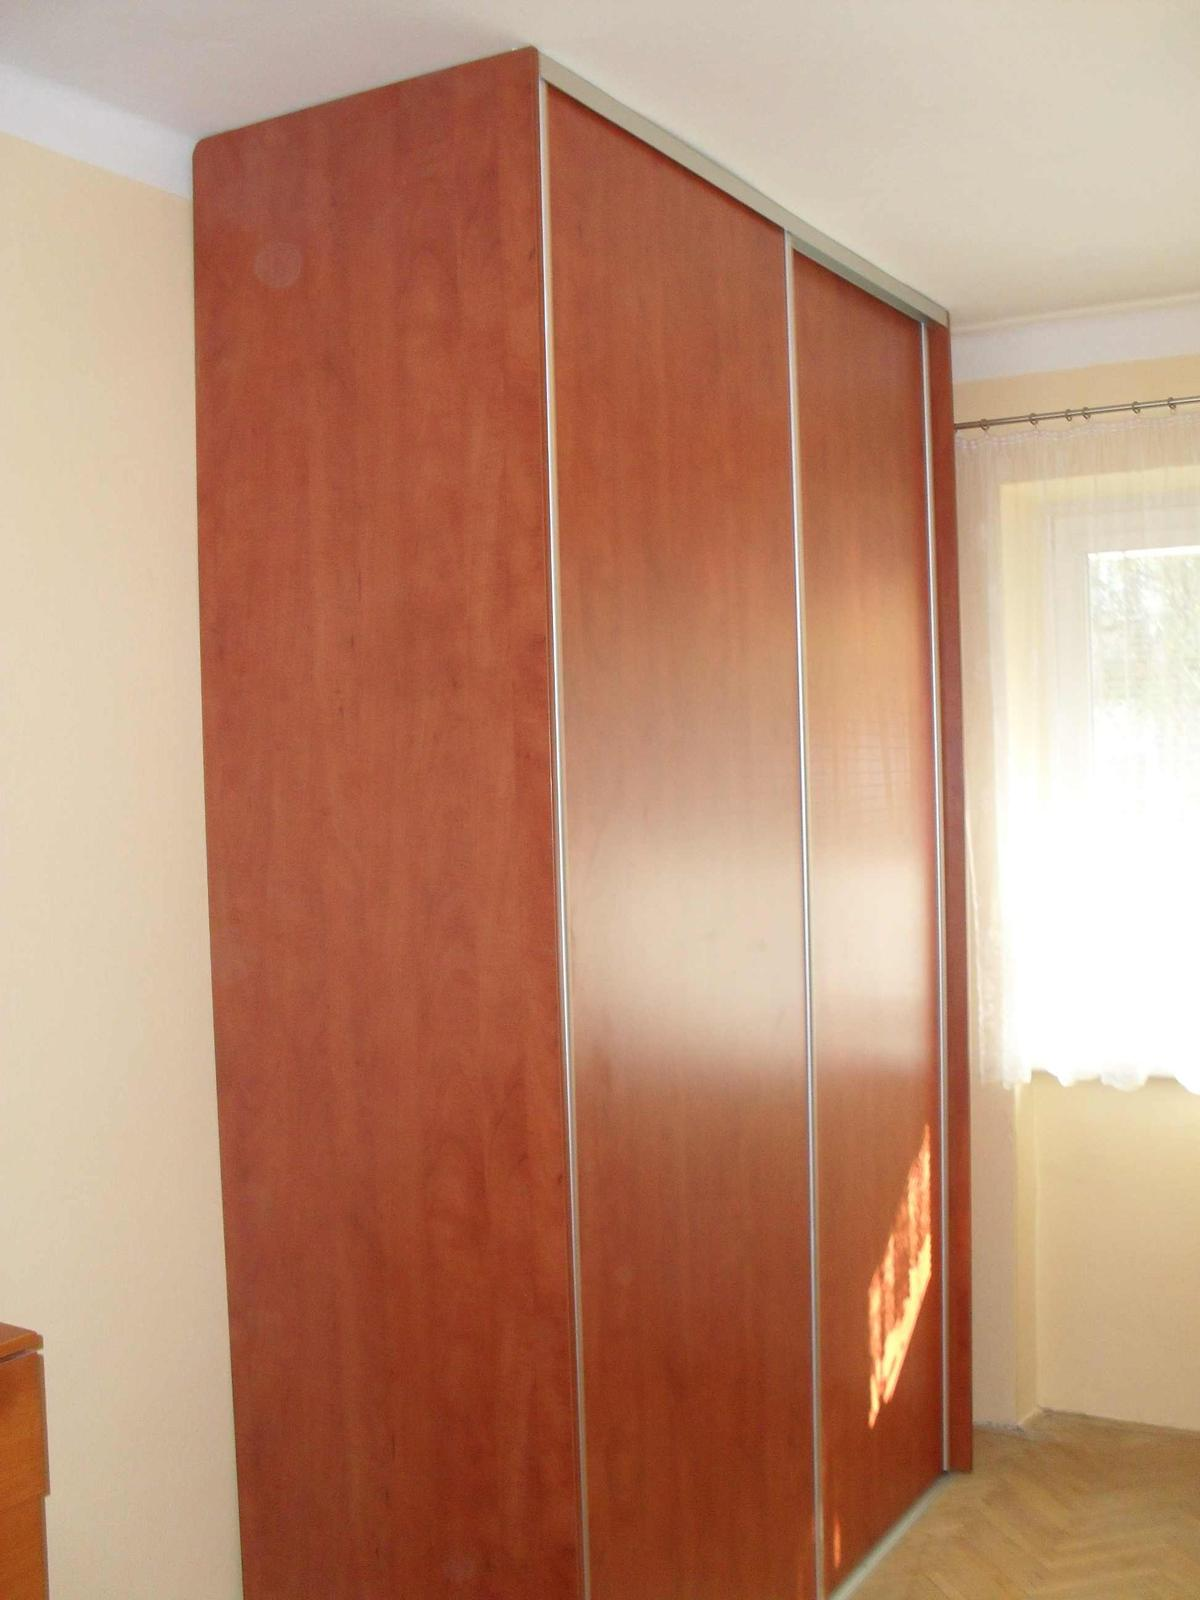 Vstavané skrine Martin Benko Bošany - Obrázok č. 28